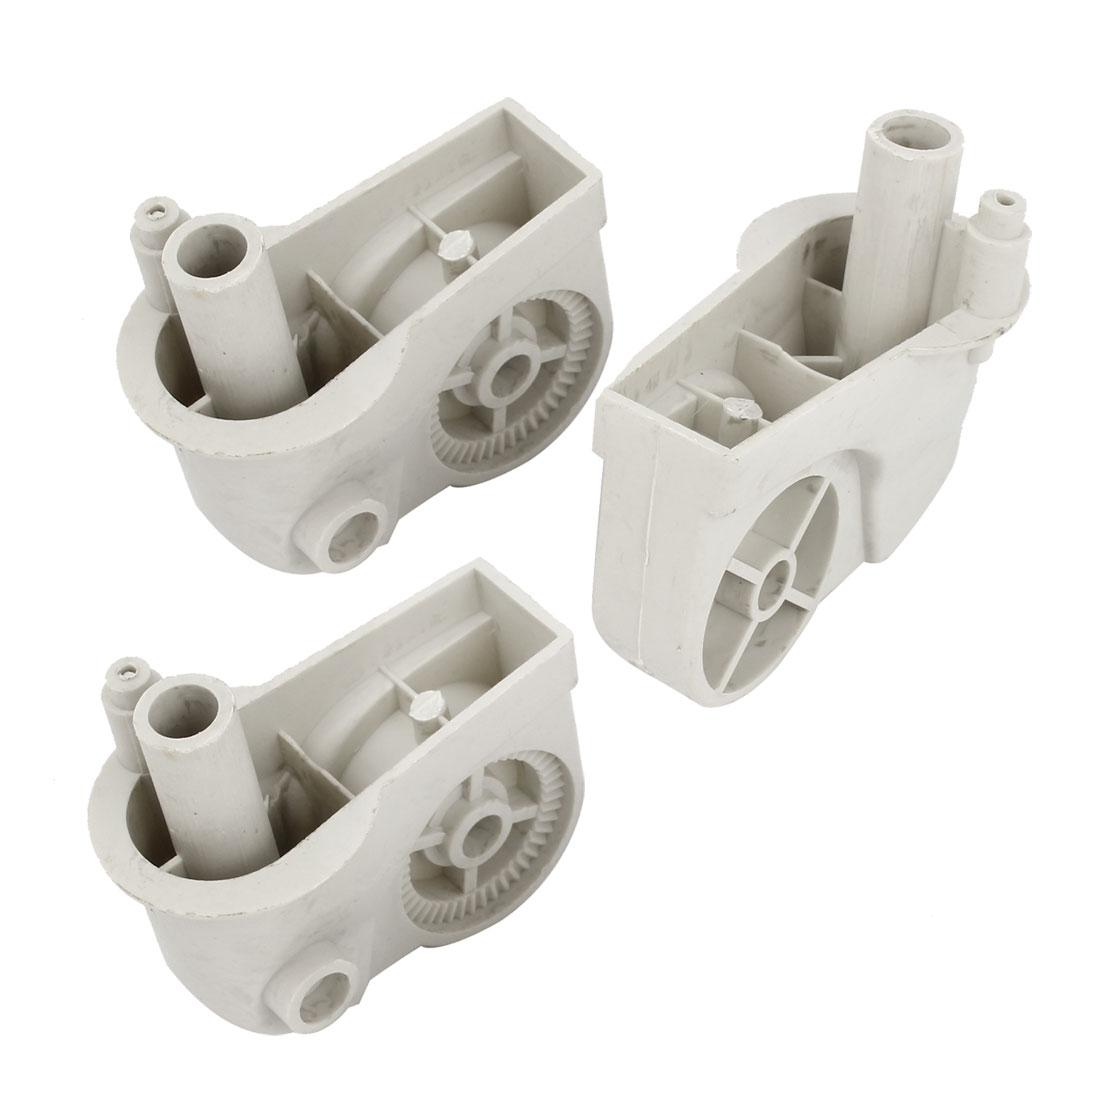 3PCS Gray Plastic Electric Fan Elbow Connectors 80mm x 44mm x 80mm